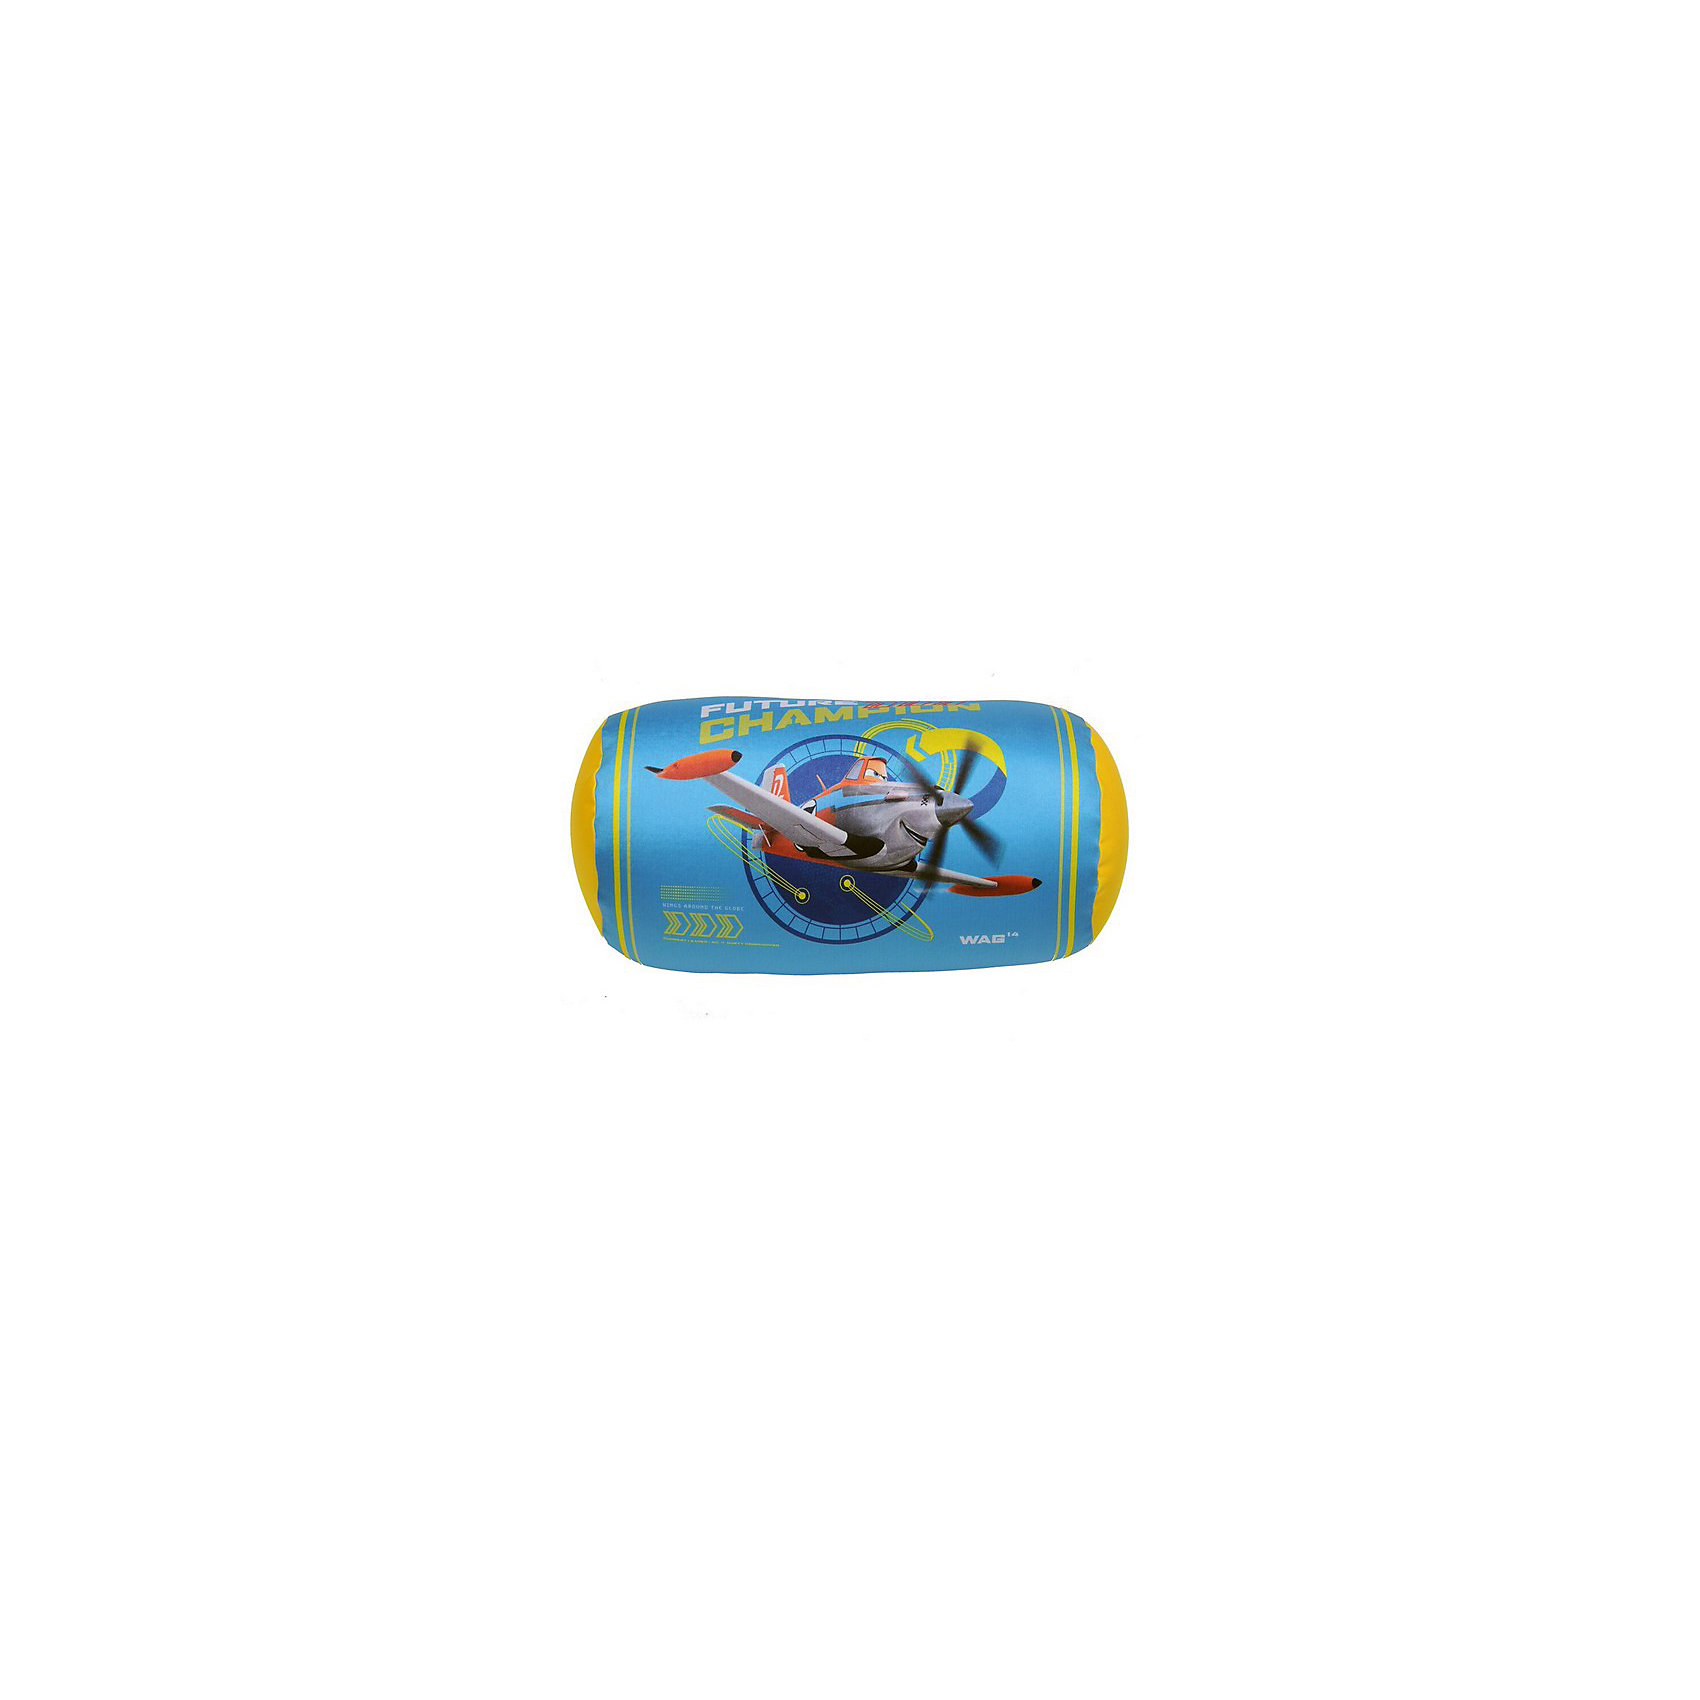 Подушка антистресс валик Самолеты 18*35, арт. 52765, Small Toys, голубой от myToys